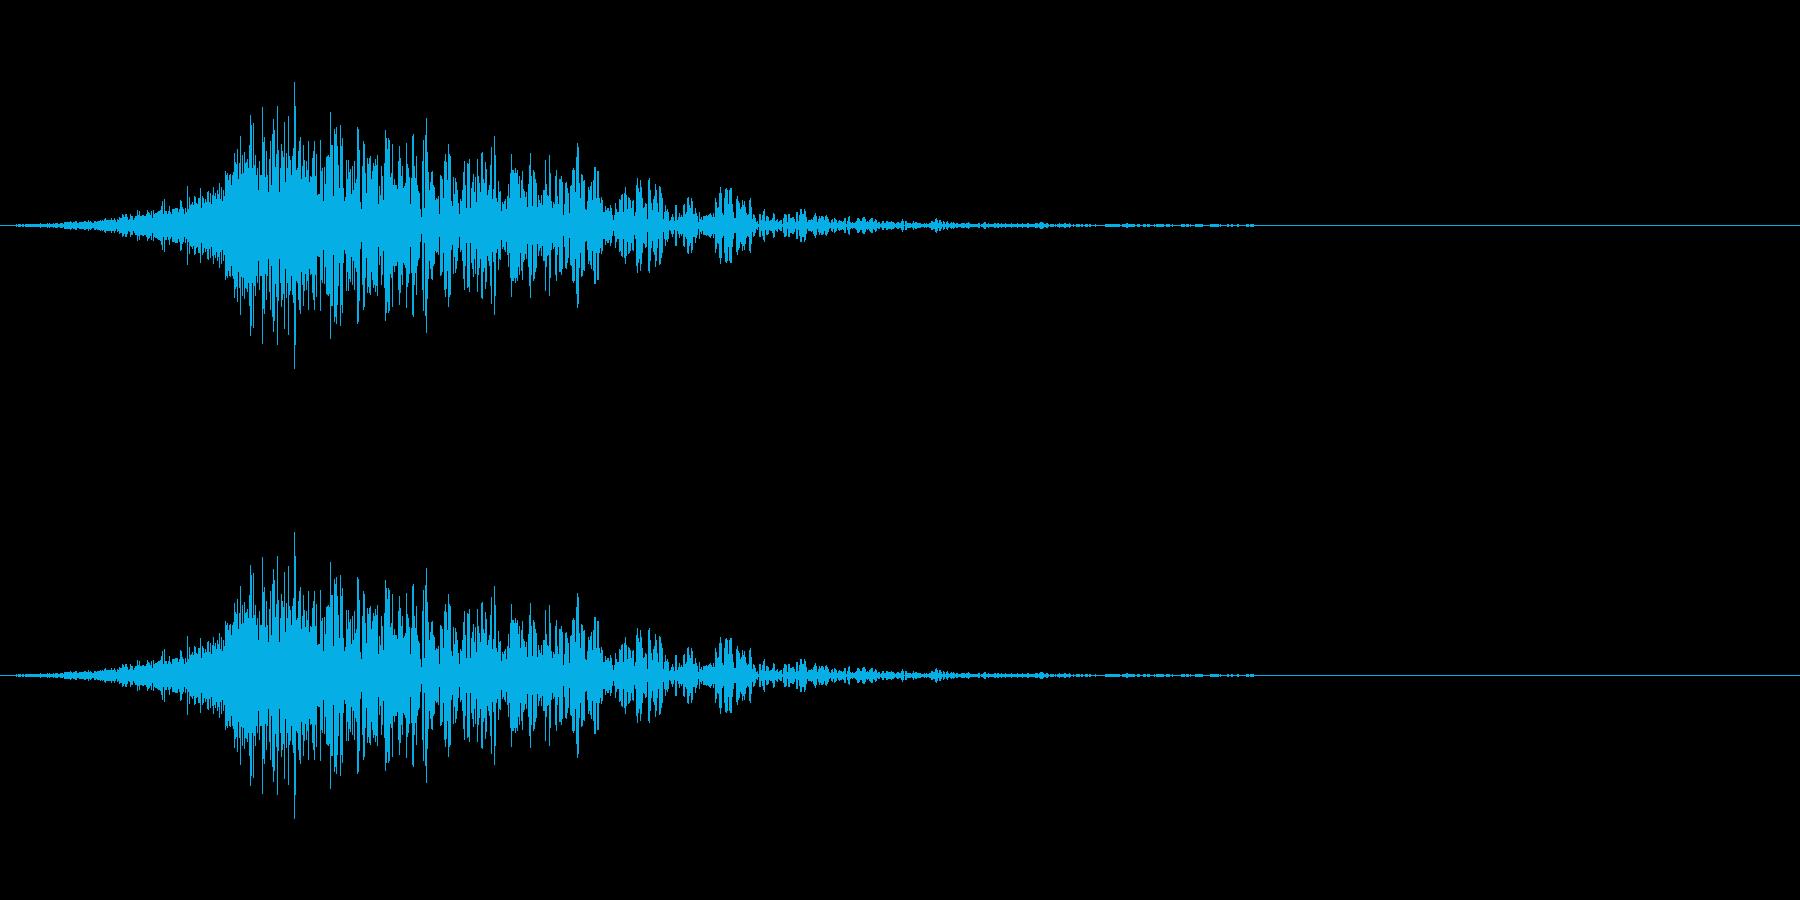 latigo 5をシューッという音の再生済みの波形